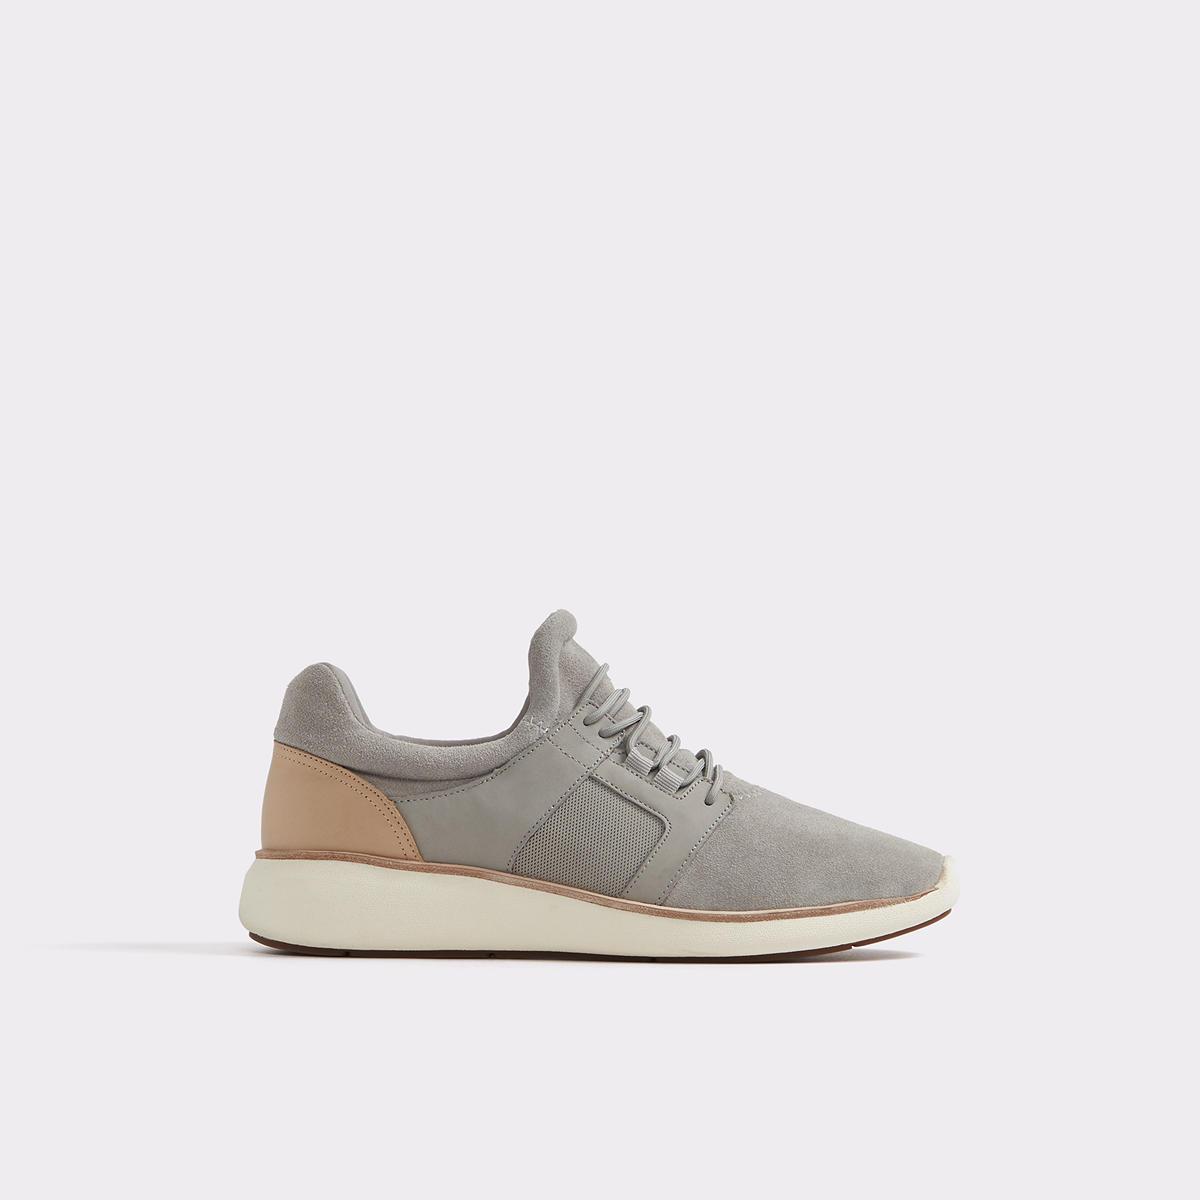 Gawley Grey Men's Sneakers | ALDO US at Aldo Shoes in Victor, NY | Tuggl